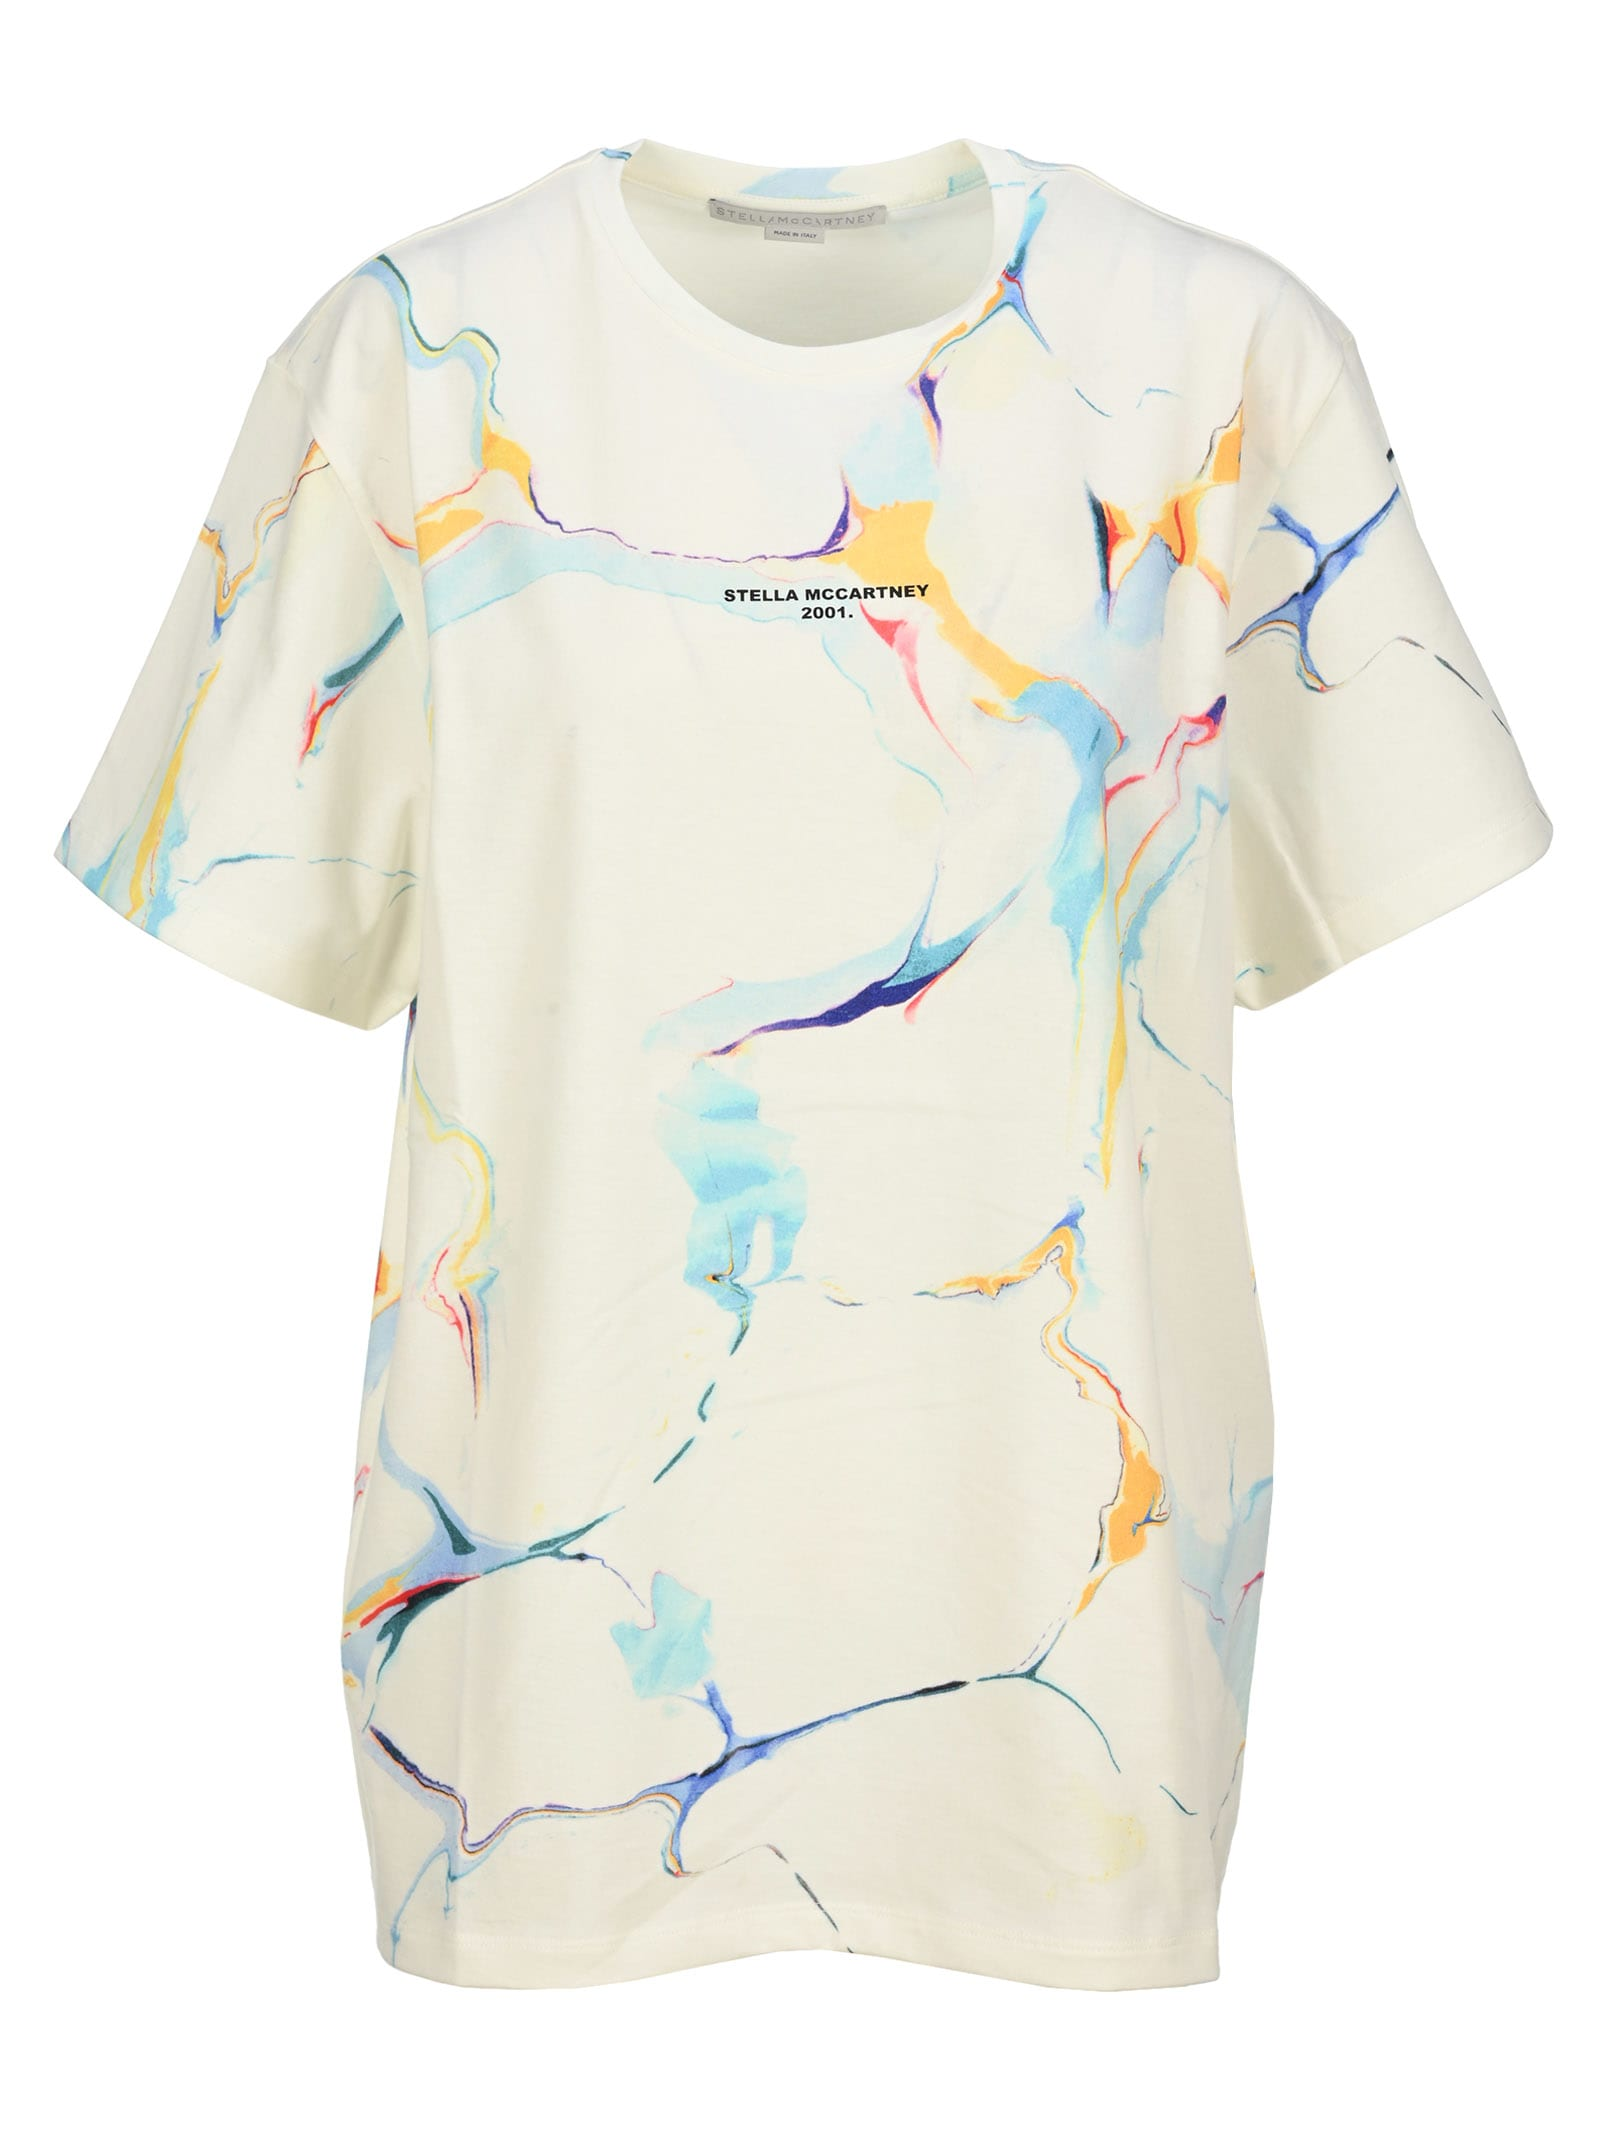 Stella McCartney Marbled T-shirt